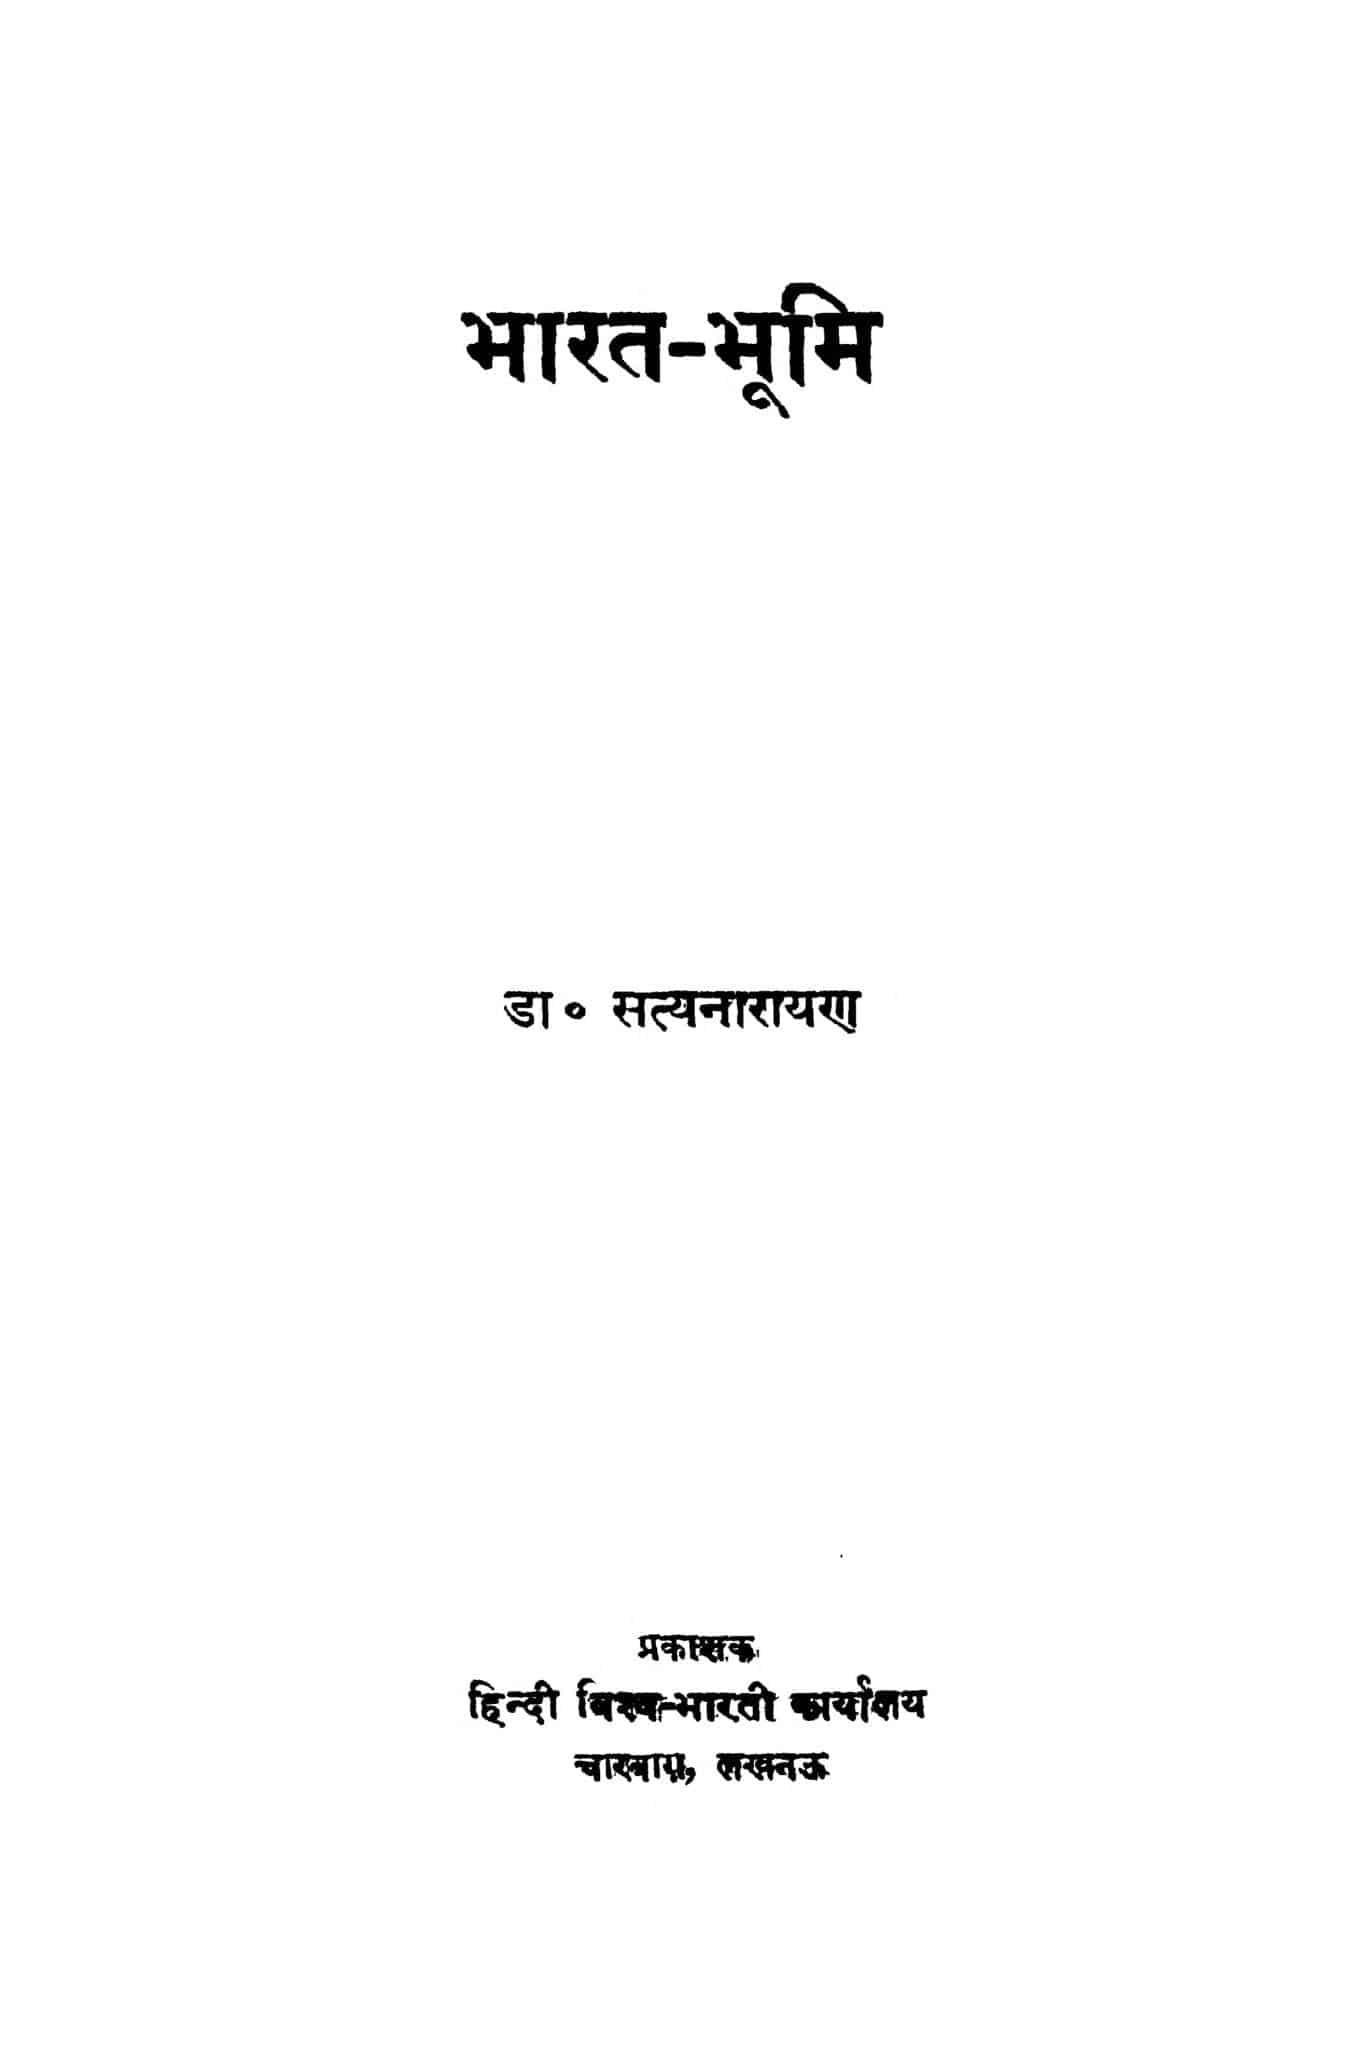 Book Image : भारत - भूमि - Bhaarat Bhuumi